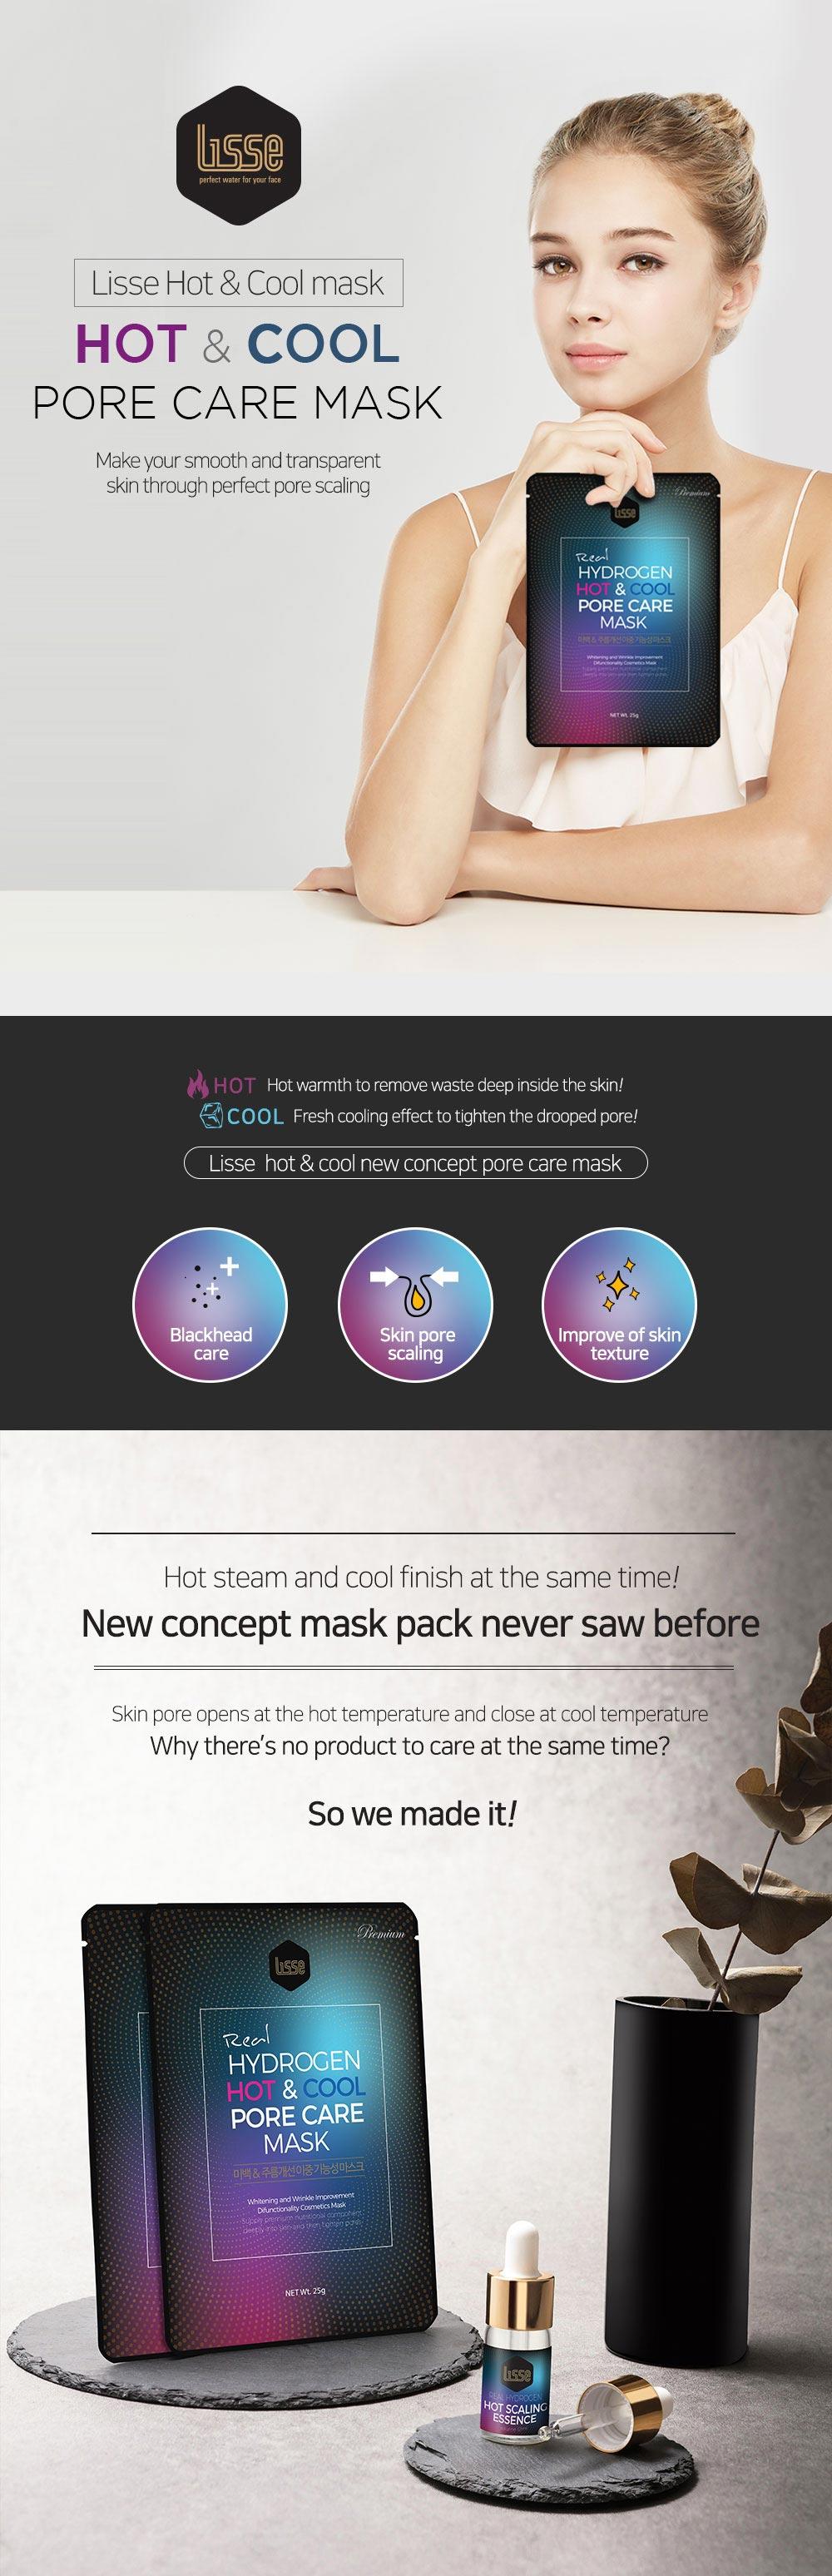 Hot & Cool Pore Care Mask